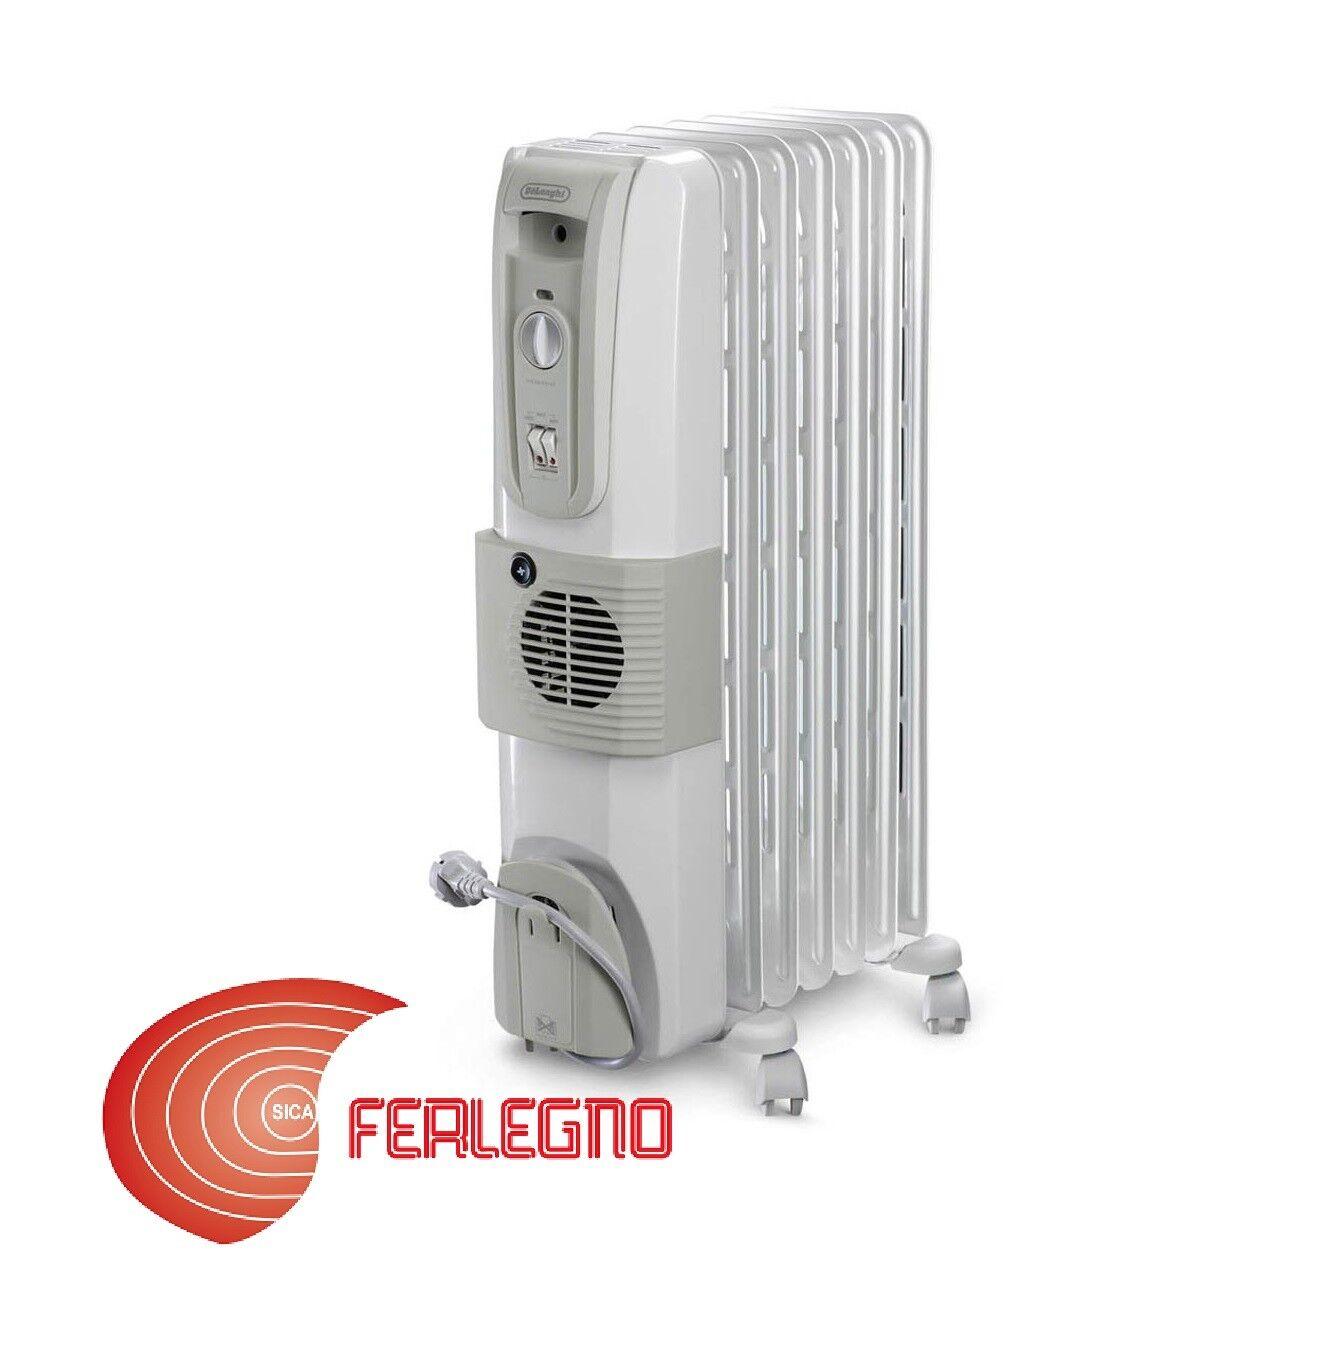 Radiator Electric Oil Painting Stove Heating 2000w White Kh770720v Delonghi